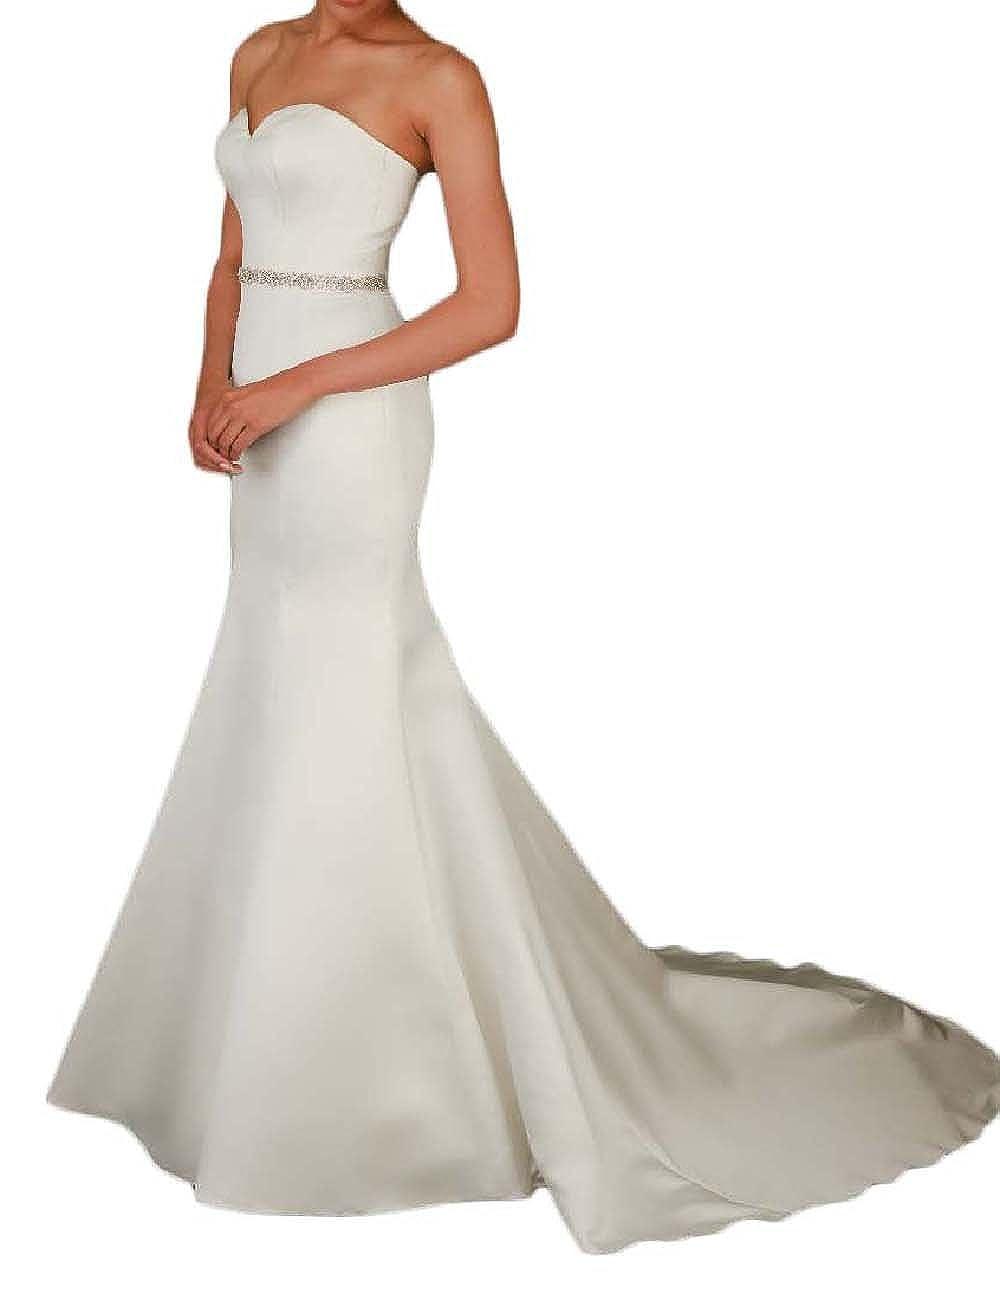 OYISHA Womens Satin Mermaid Wedding Bridal Dress with Sweep Train Beaded WD024